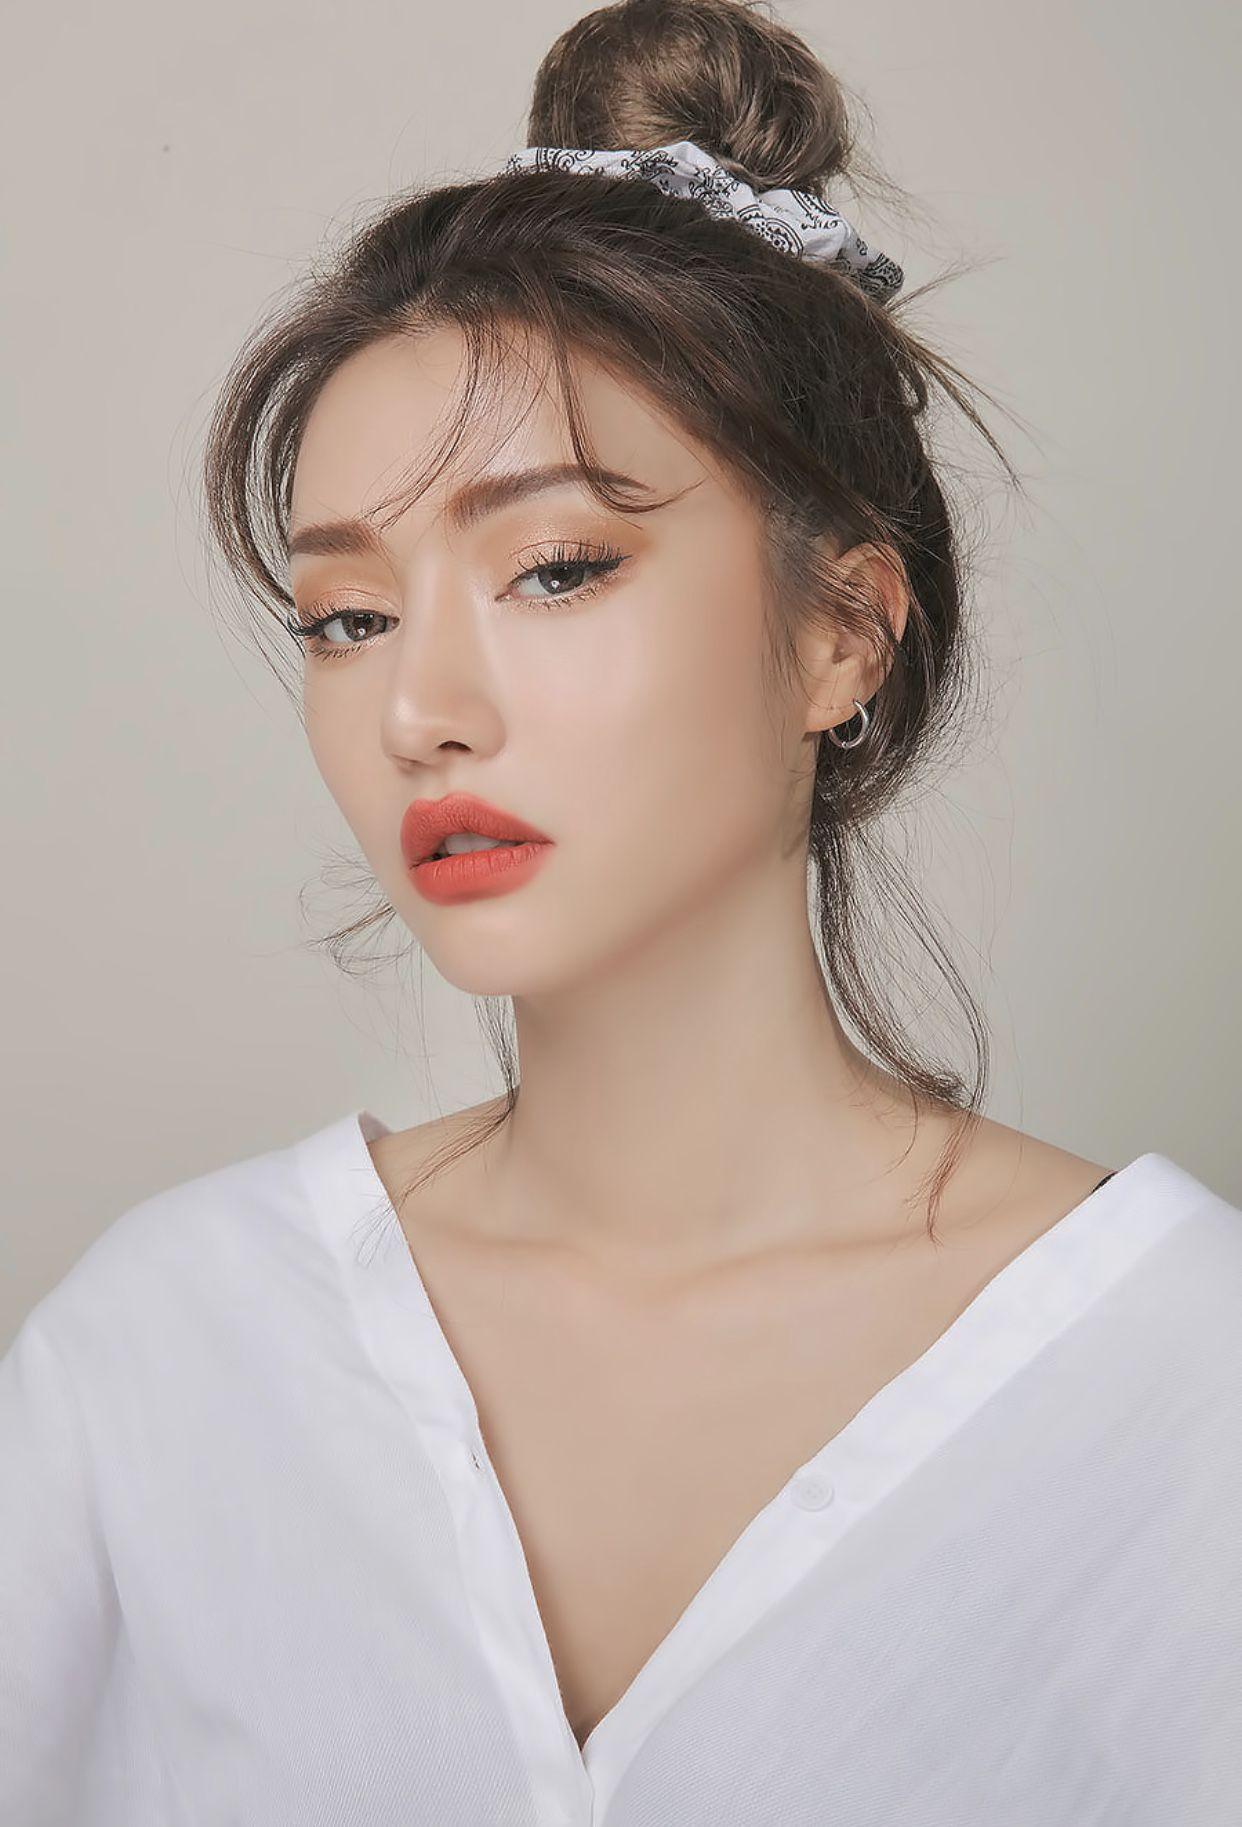 𝚙𝚒𝚗𝚝𝚎𝚛𝚎𝚜𝚝 𝚖𝚊𝚝𝚌𝚑𝚊𝚋𝚞𝚗 Natural summer makeup, Korean